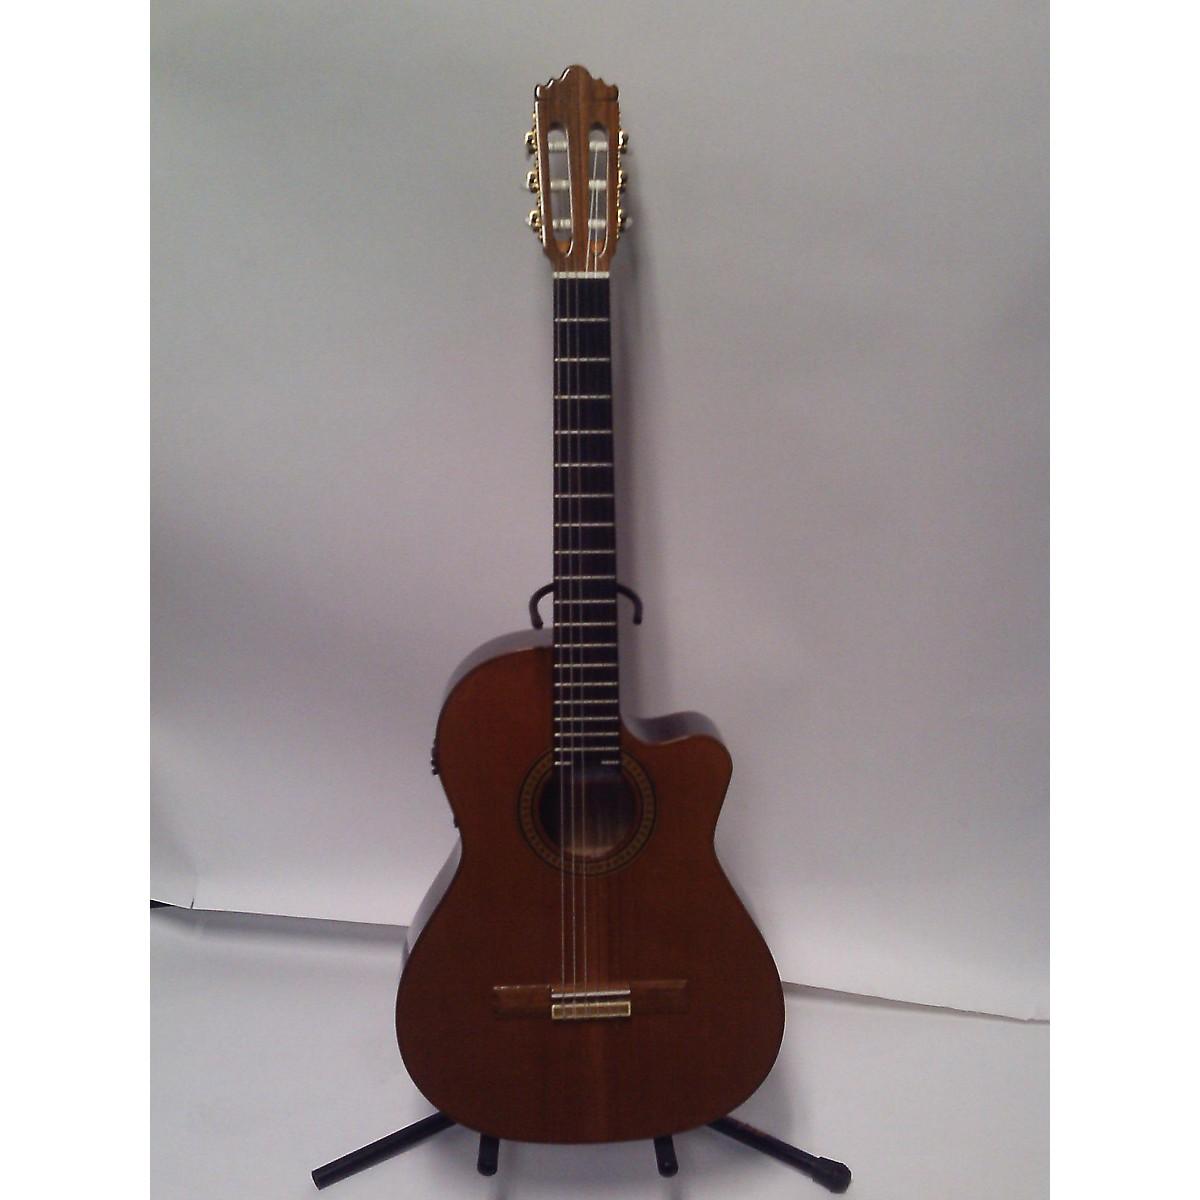 Jose Ramirez 2 CWE Classical Acoustic Electric Guitar